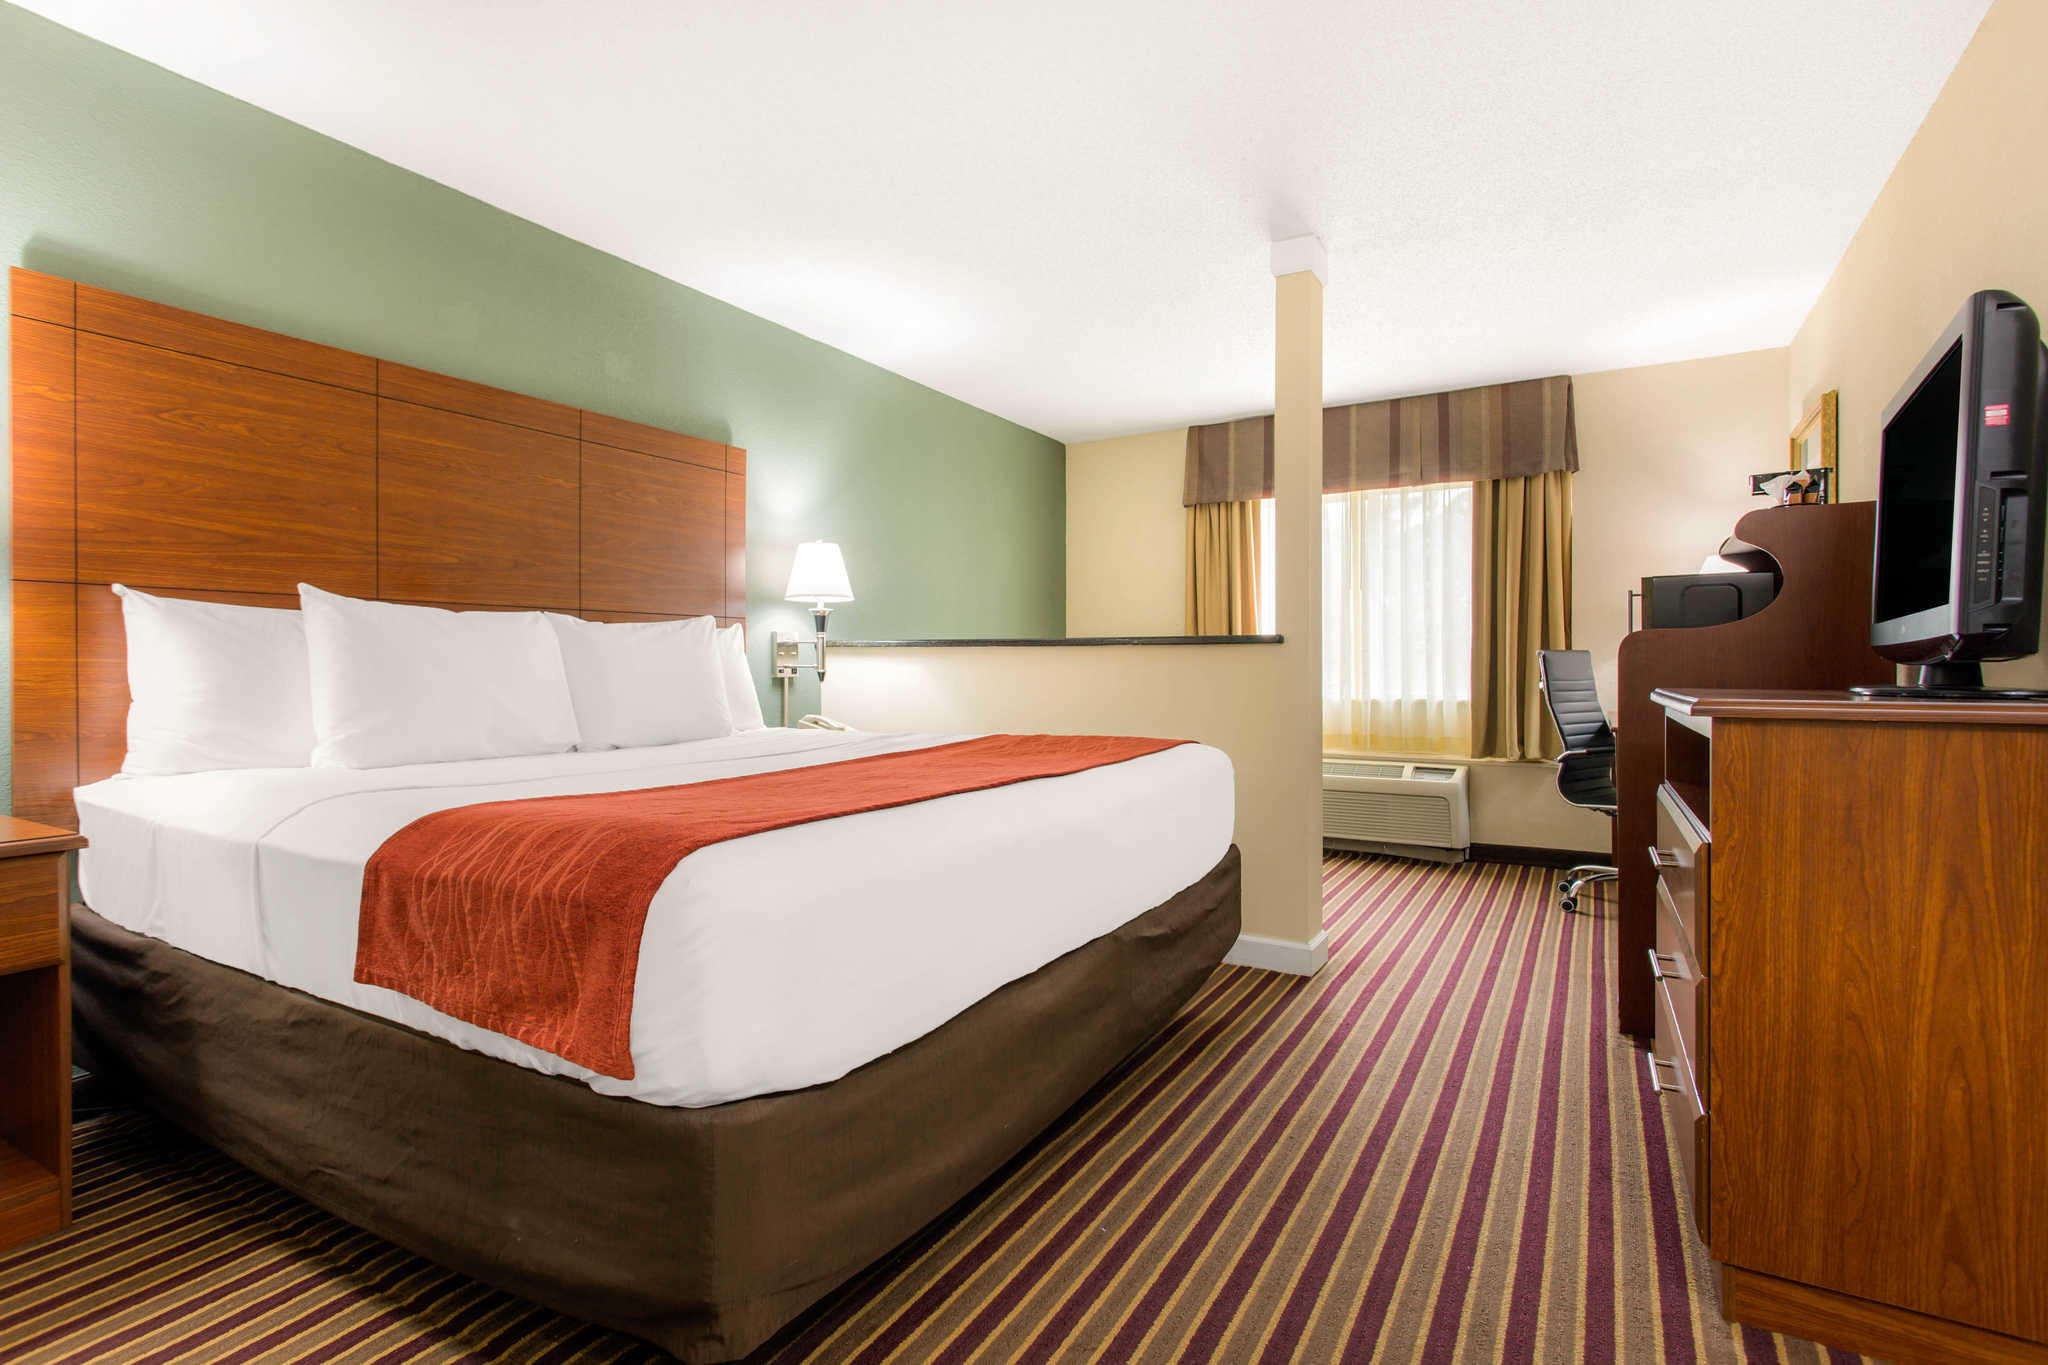 Comfort Inn & Suites Crabtree Valley image 19